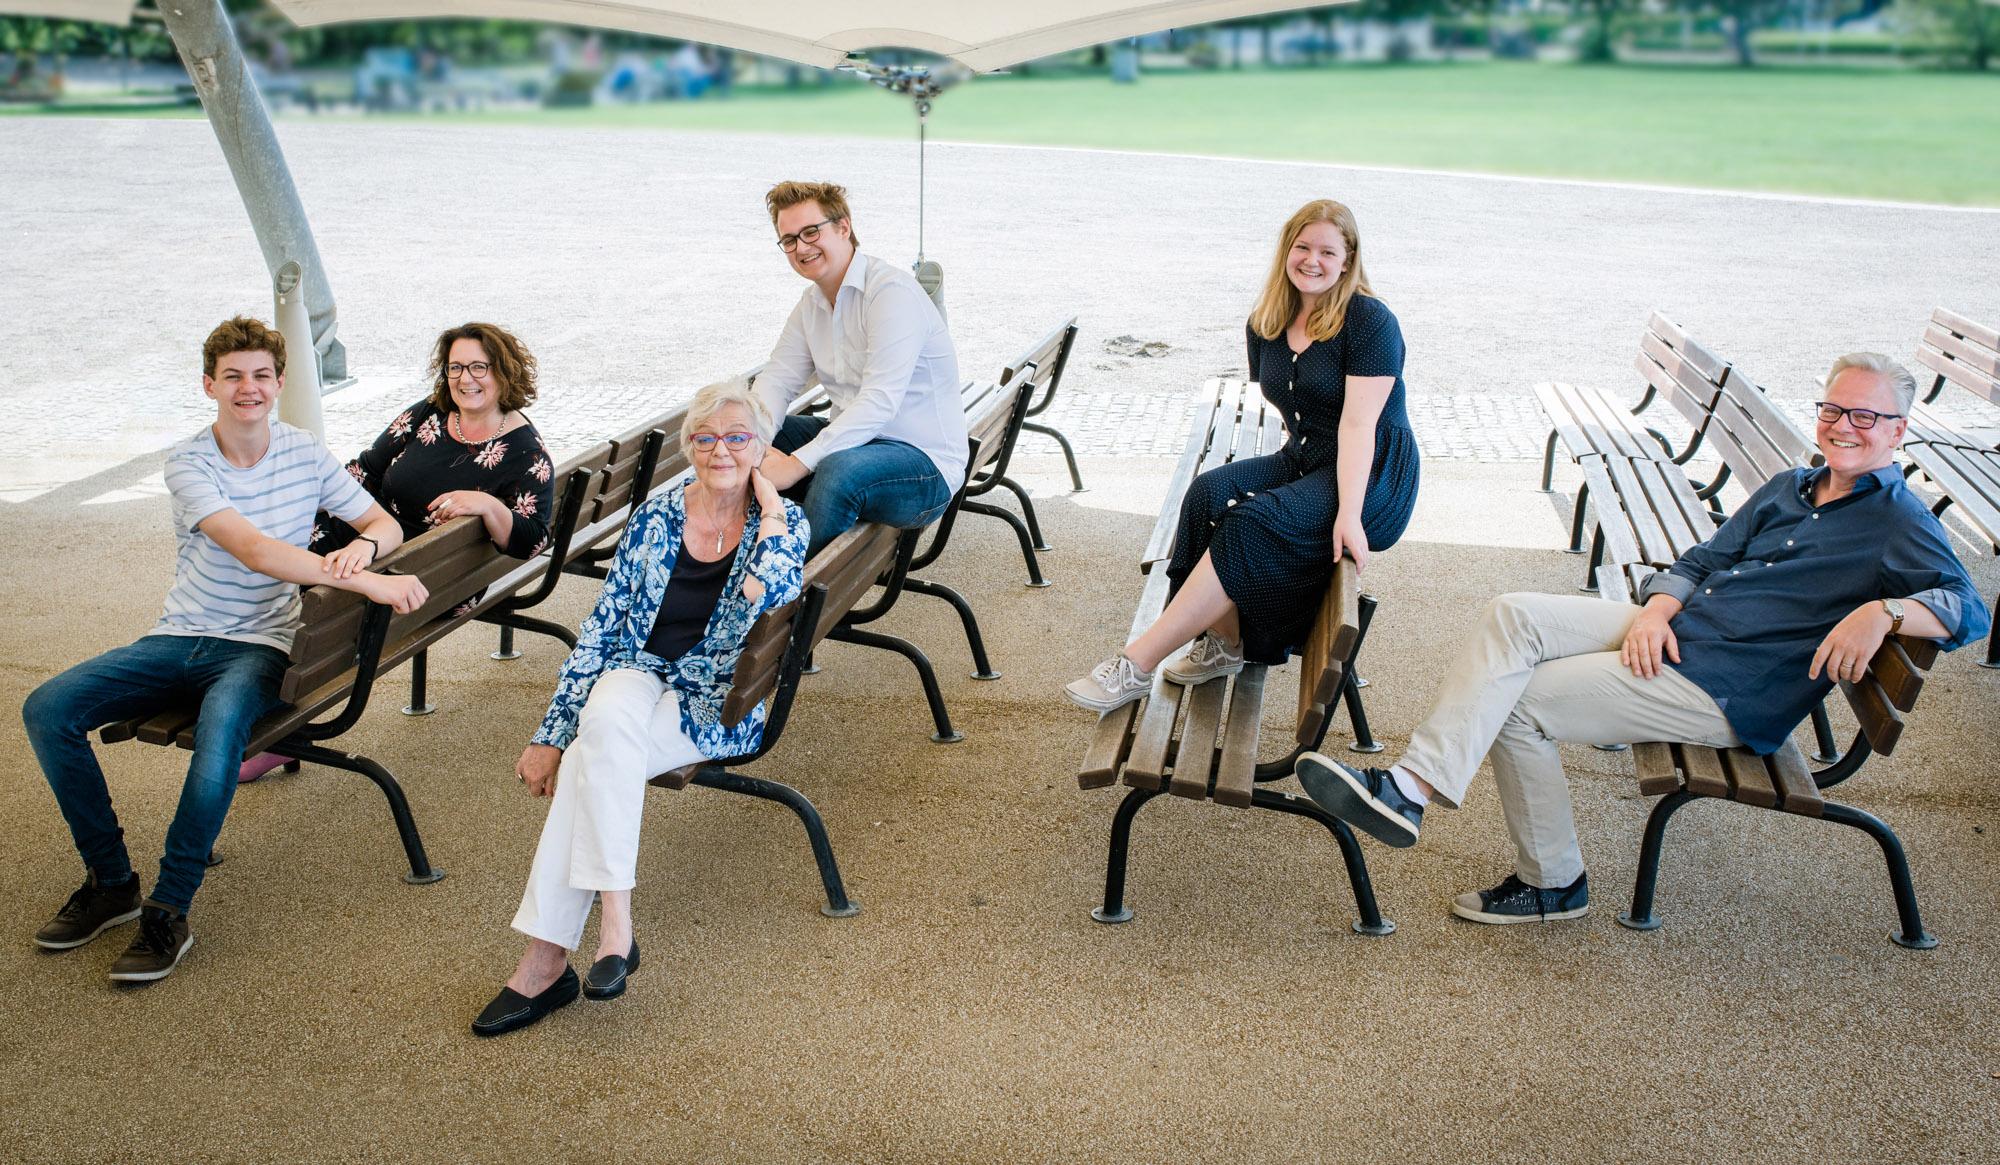 Familienshooting-Travemuende-Familienfotos-Bruegmanngarten